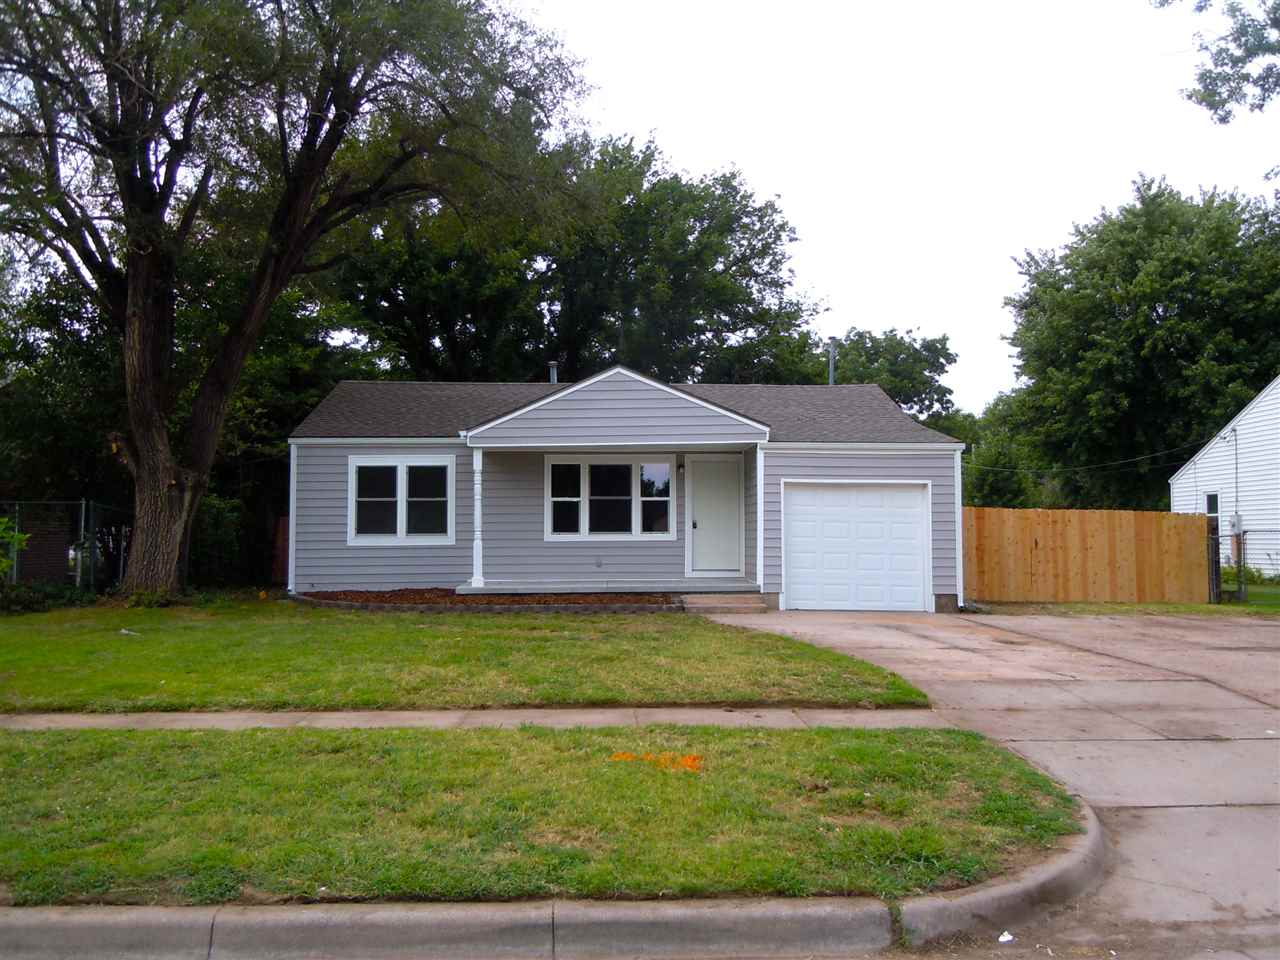 2947 S Walnut, Wichita, KS 67217